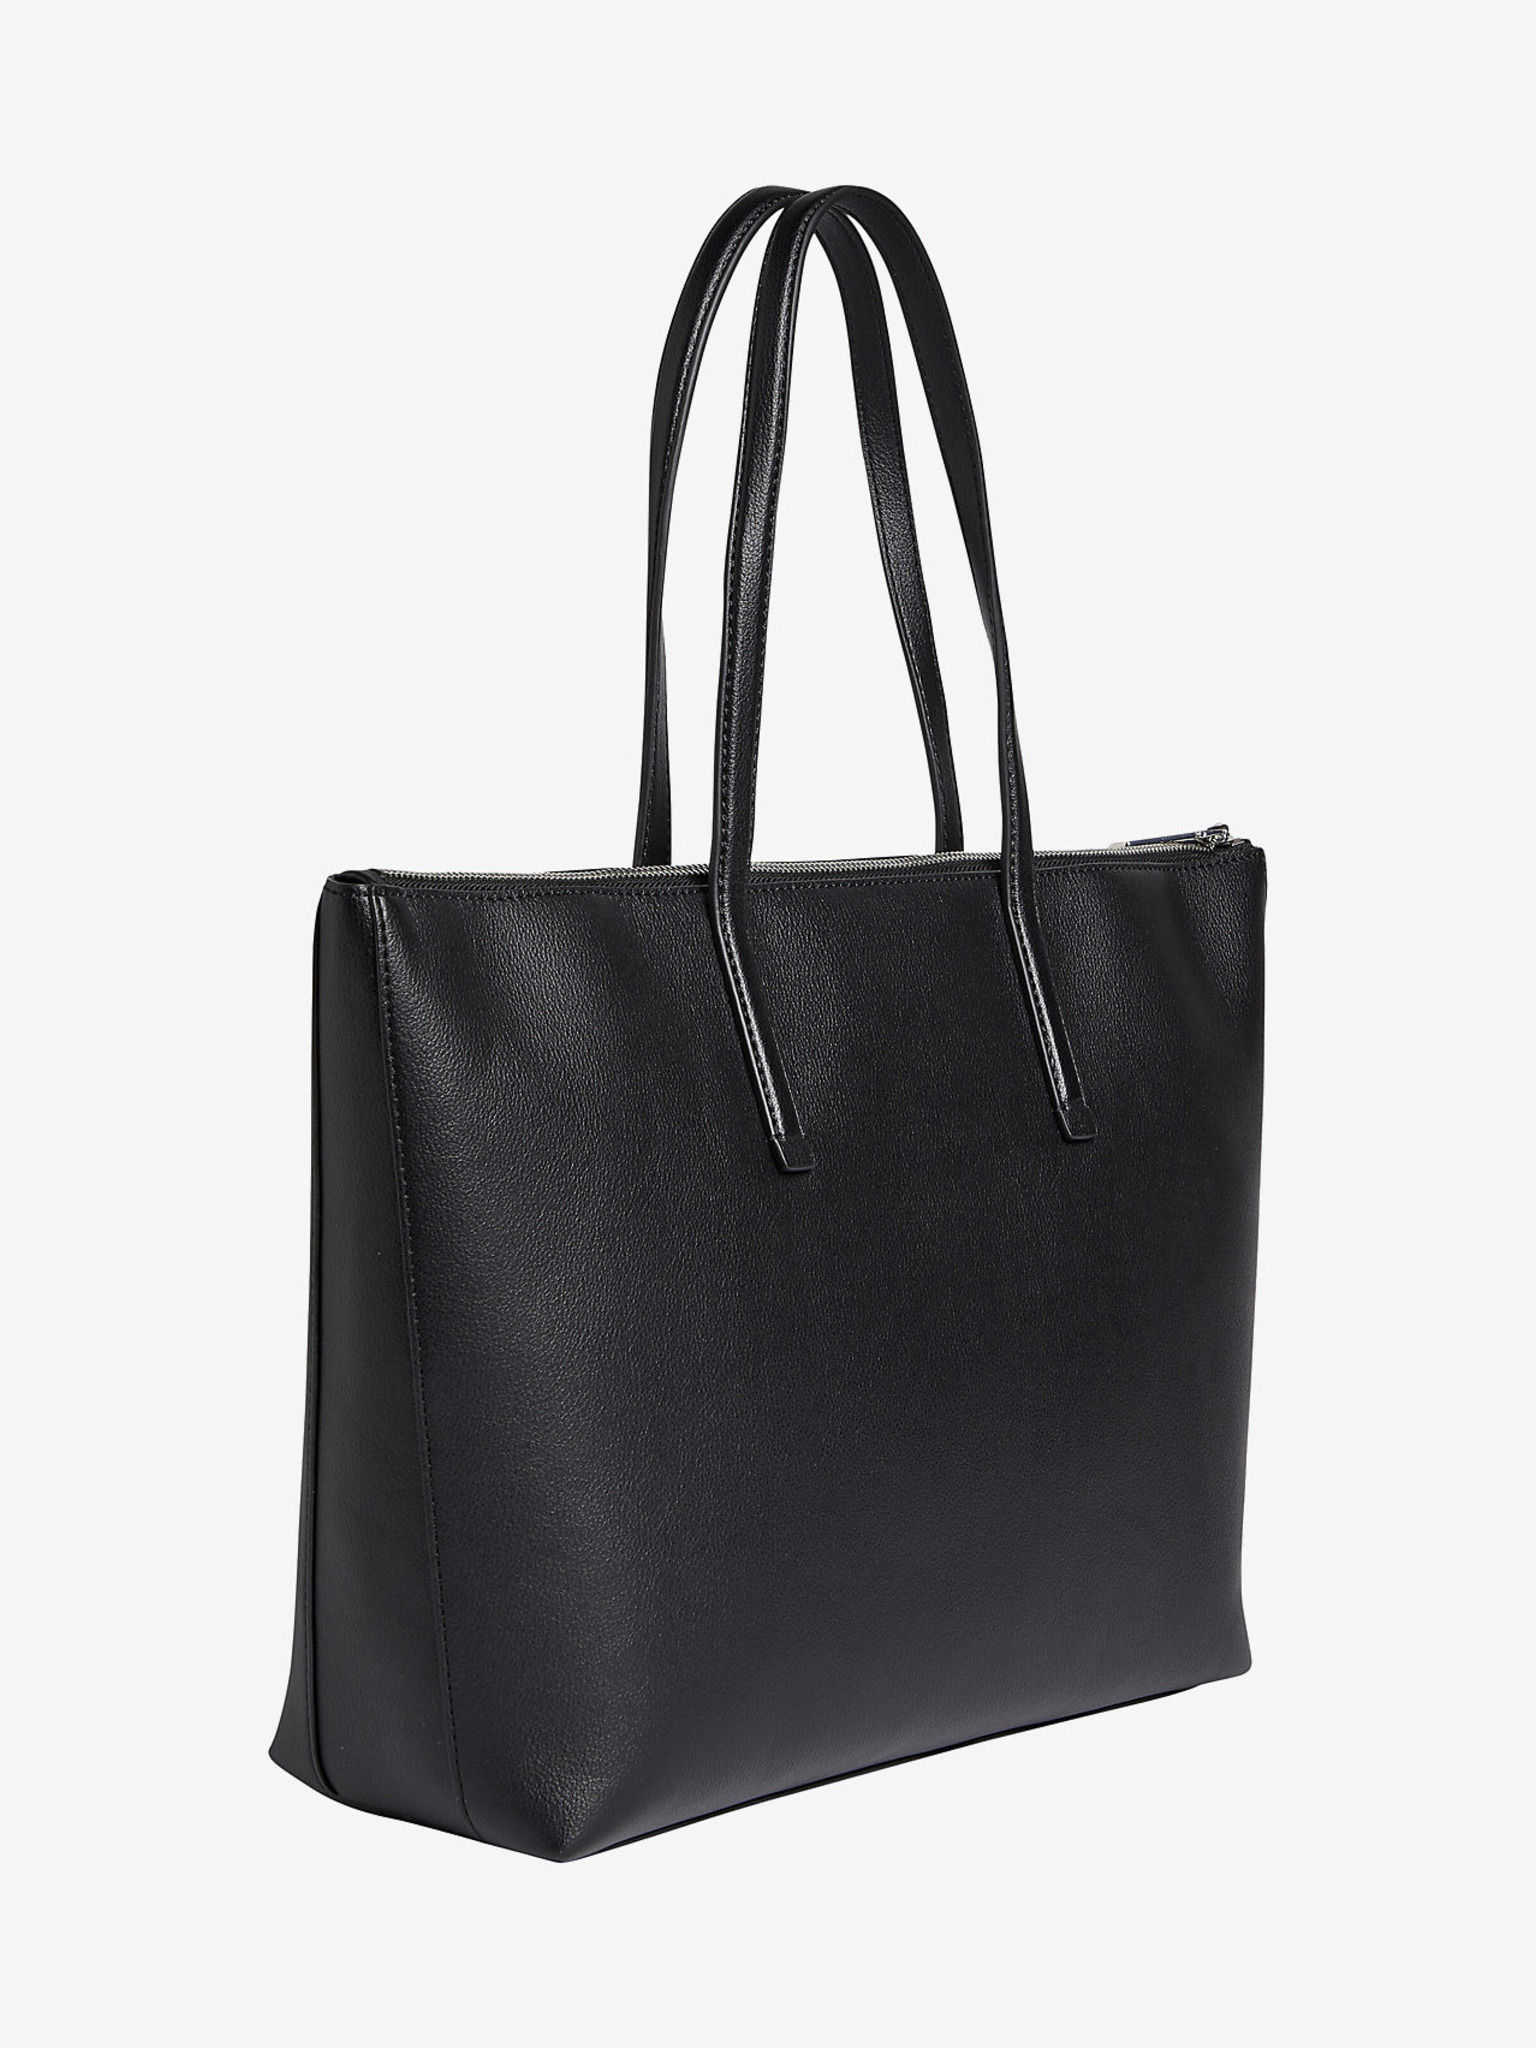 Calvin Klein czarny shopper Must